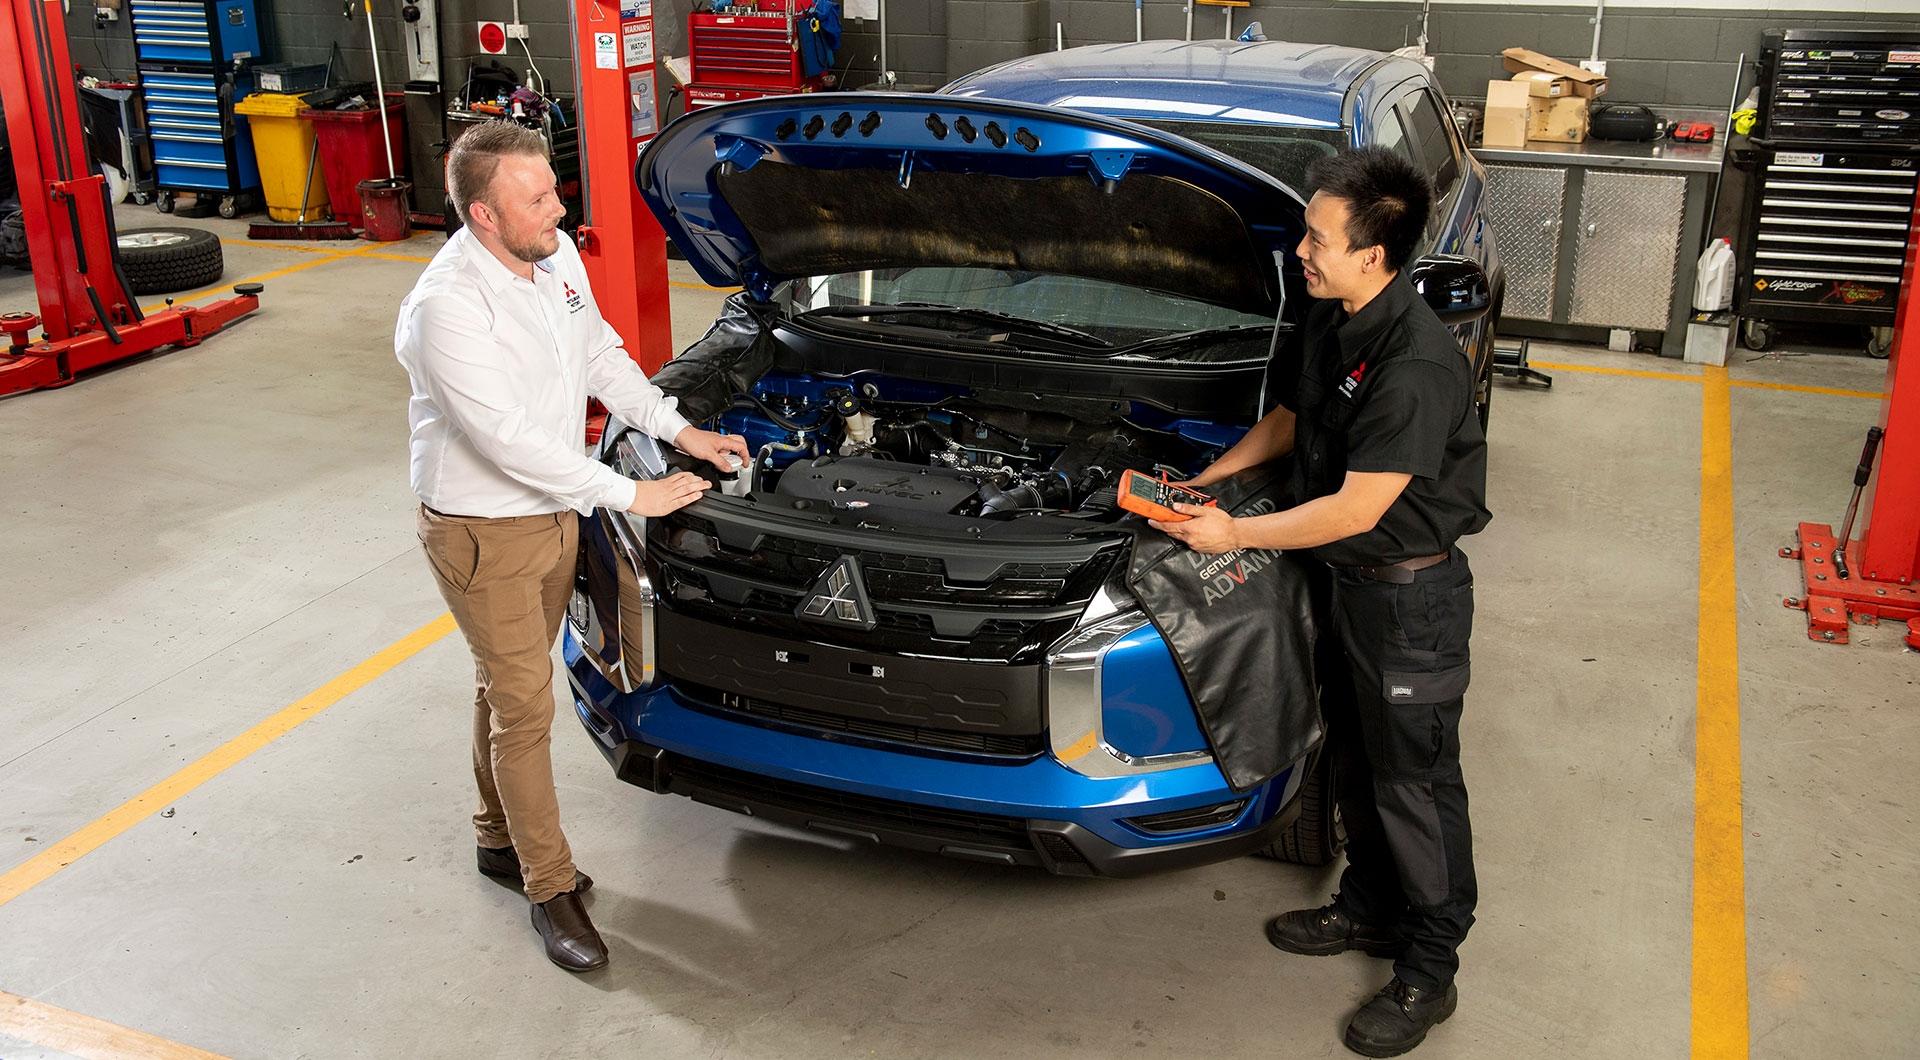 Q&A with Mitsubishi Master Technician